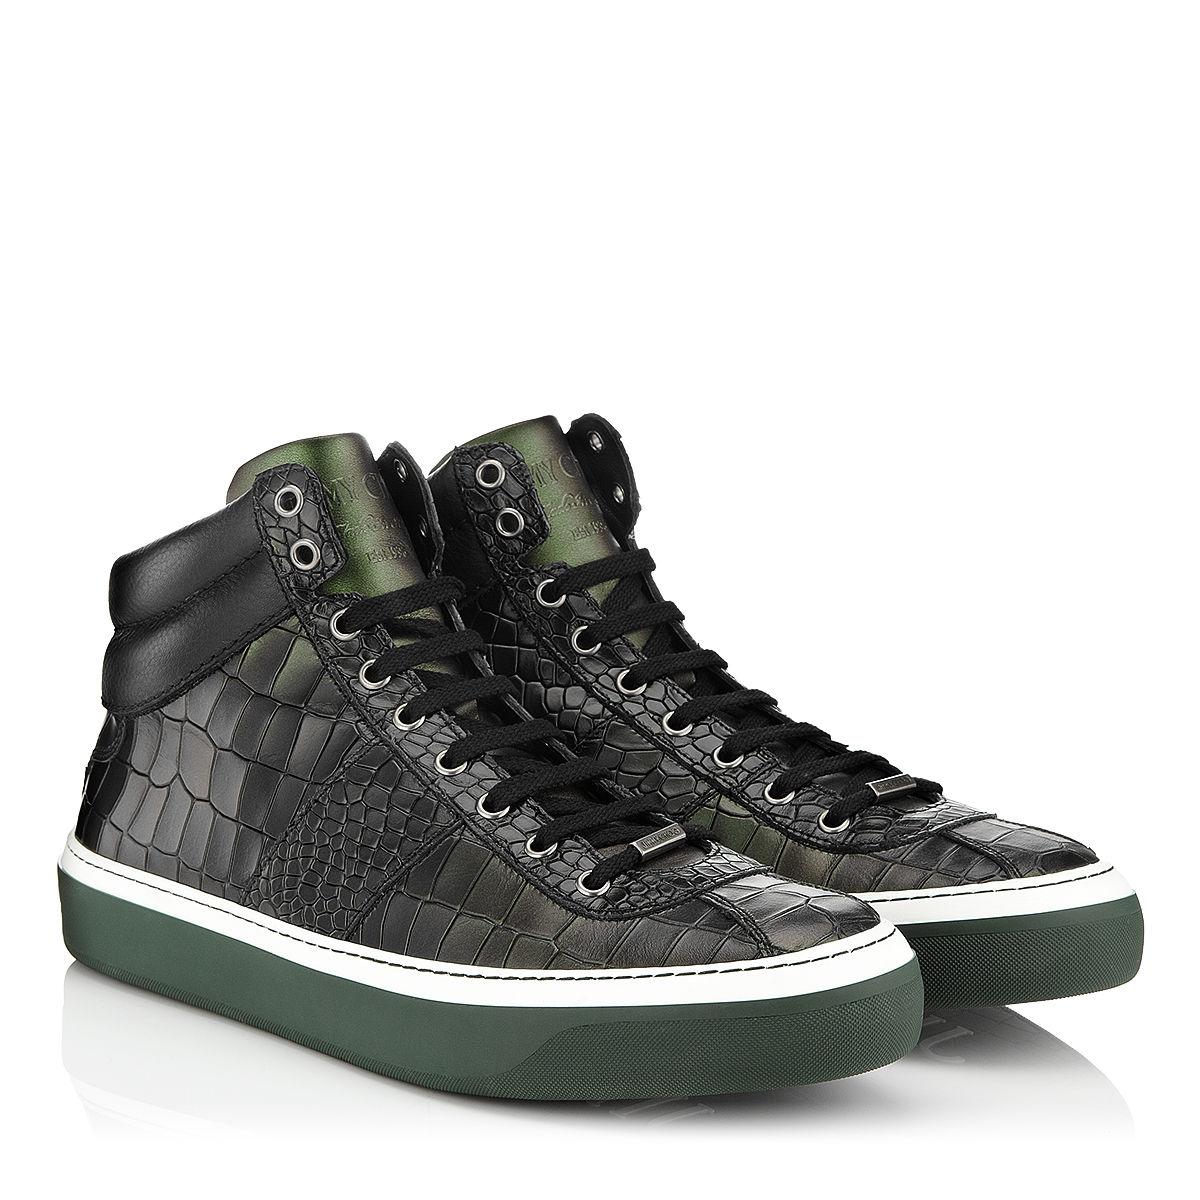 Replica Jimmy Choo Shoes Men